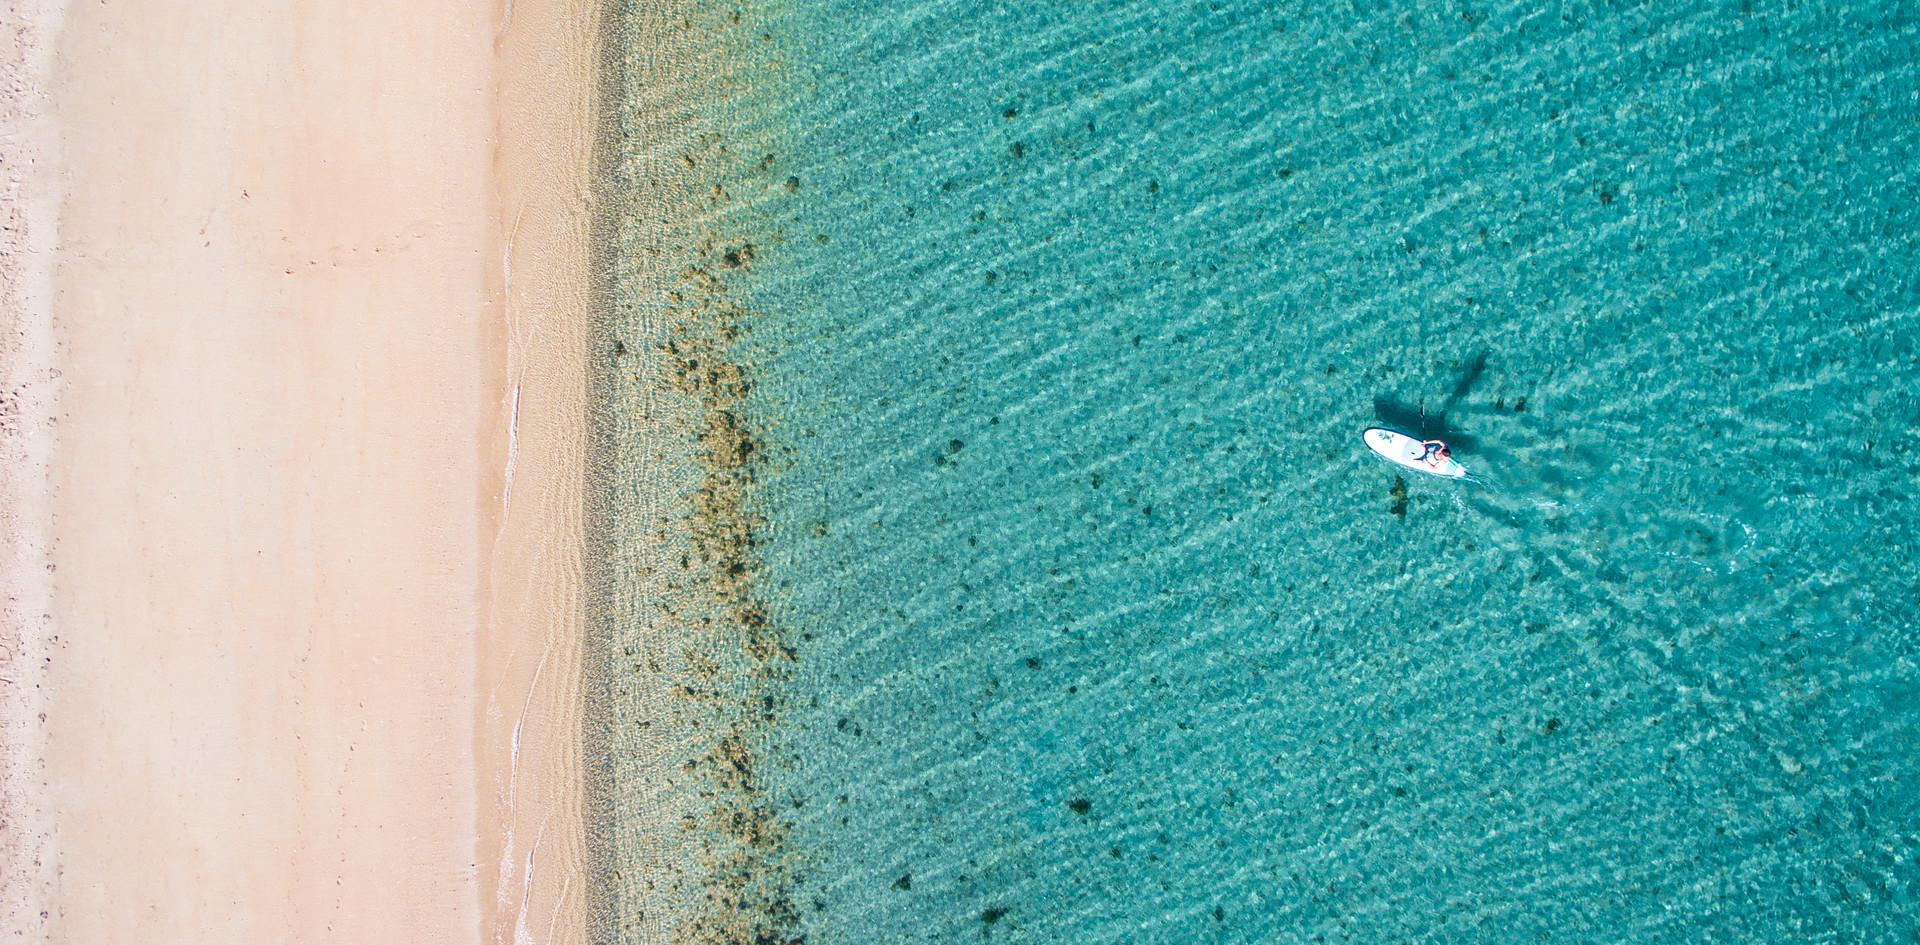 mackerel-islands-thevenard-island-SUP-ae